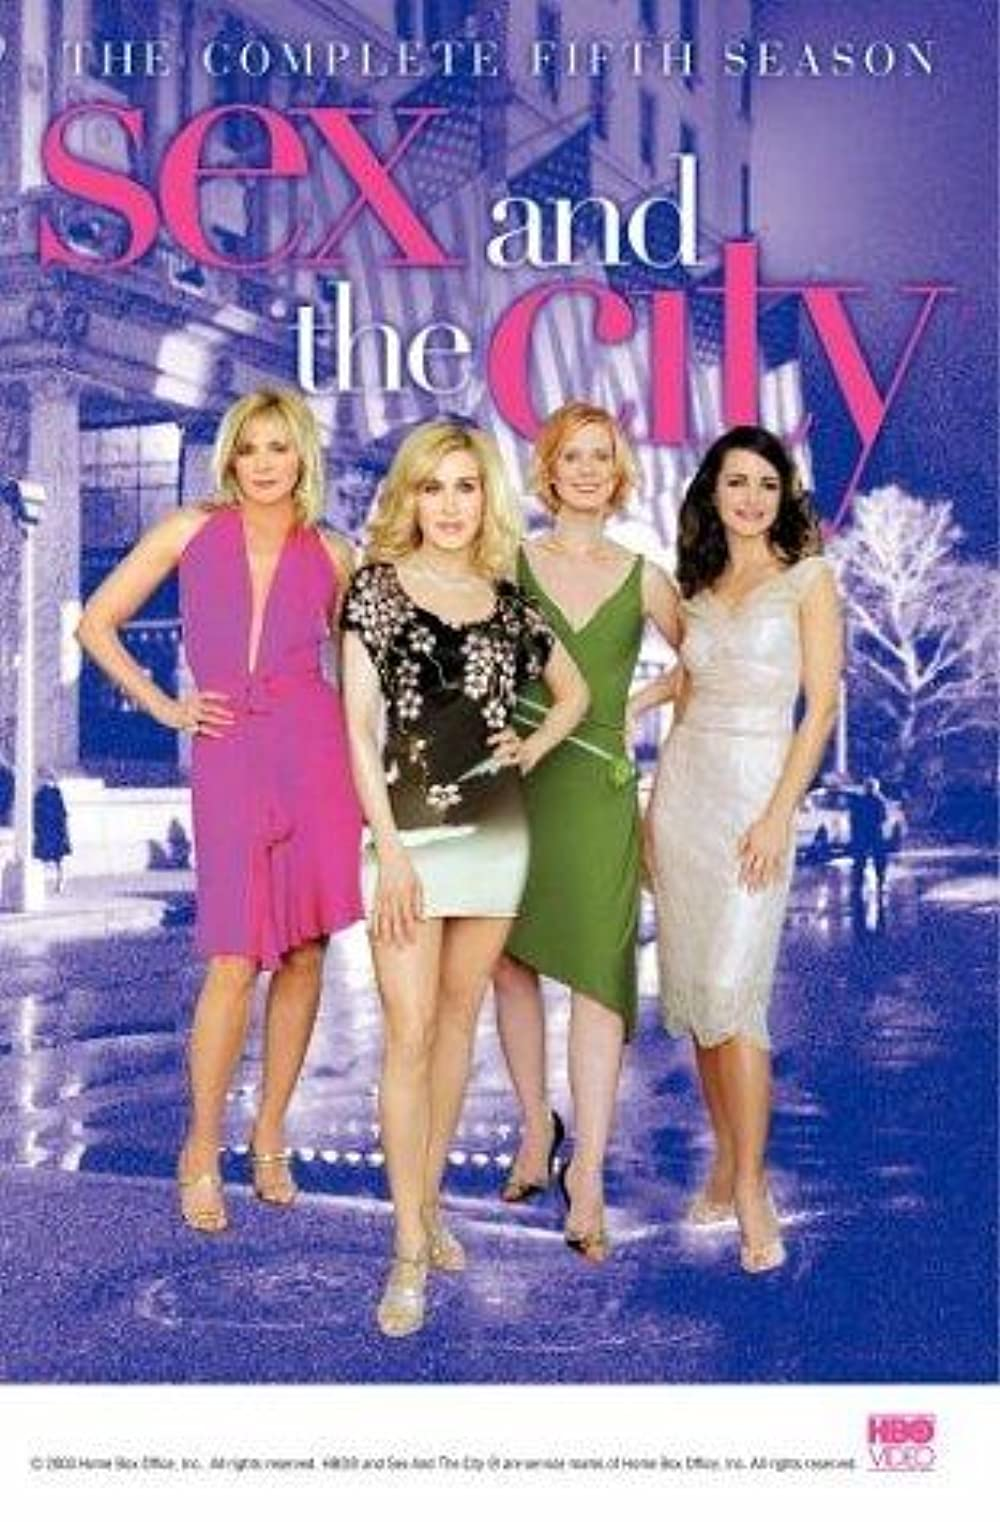 Sex & the city showtimes